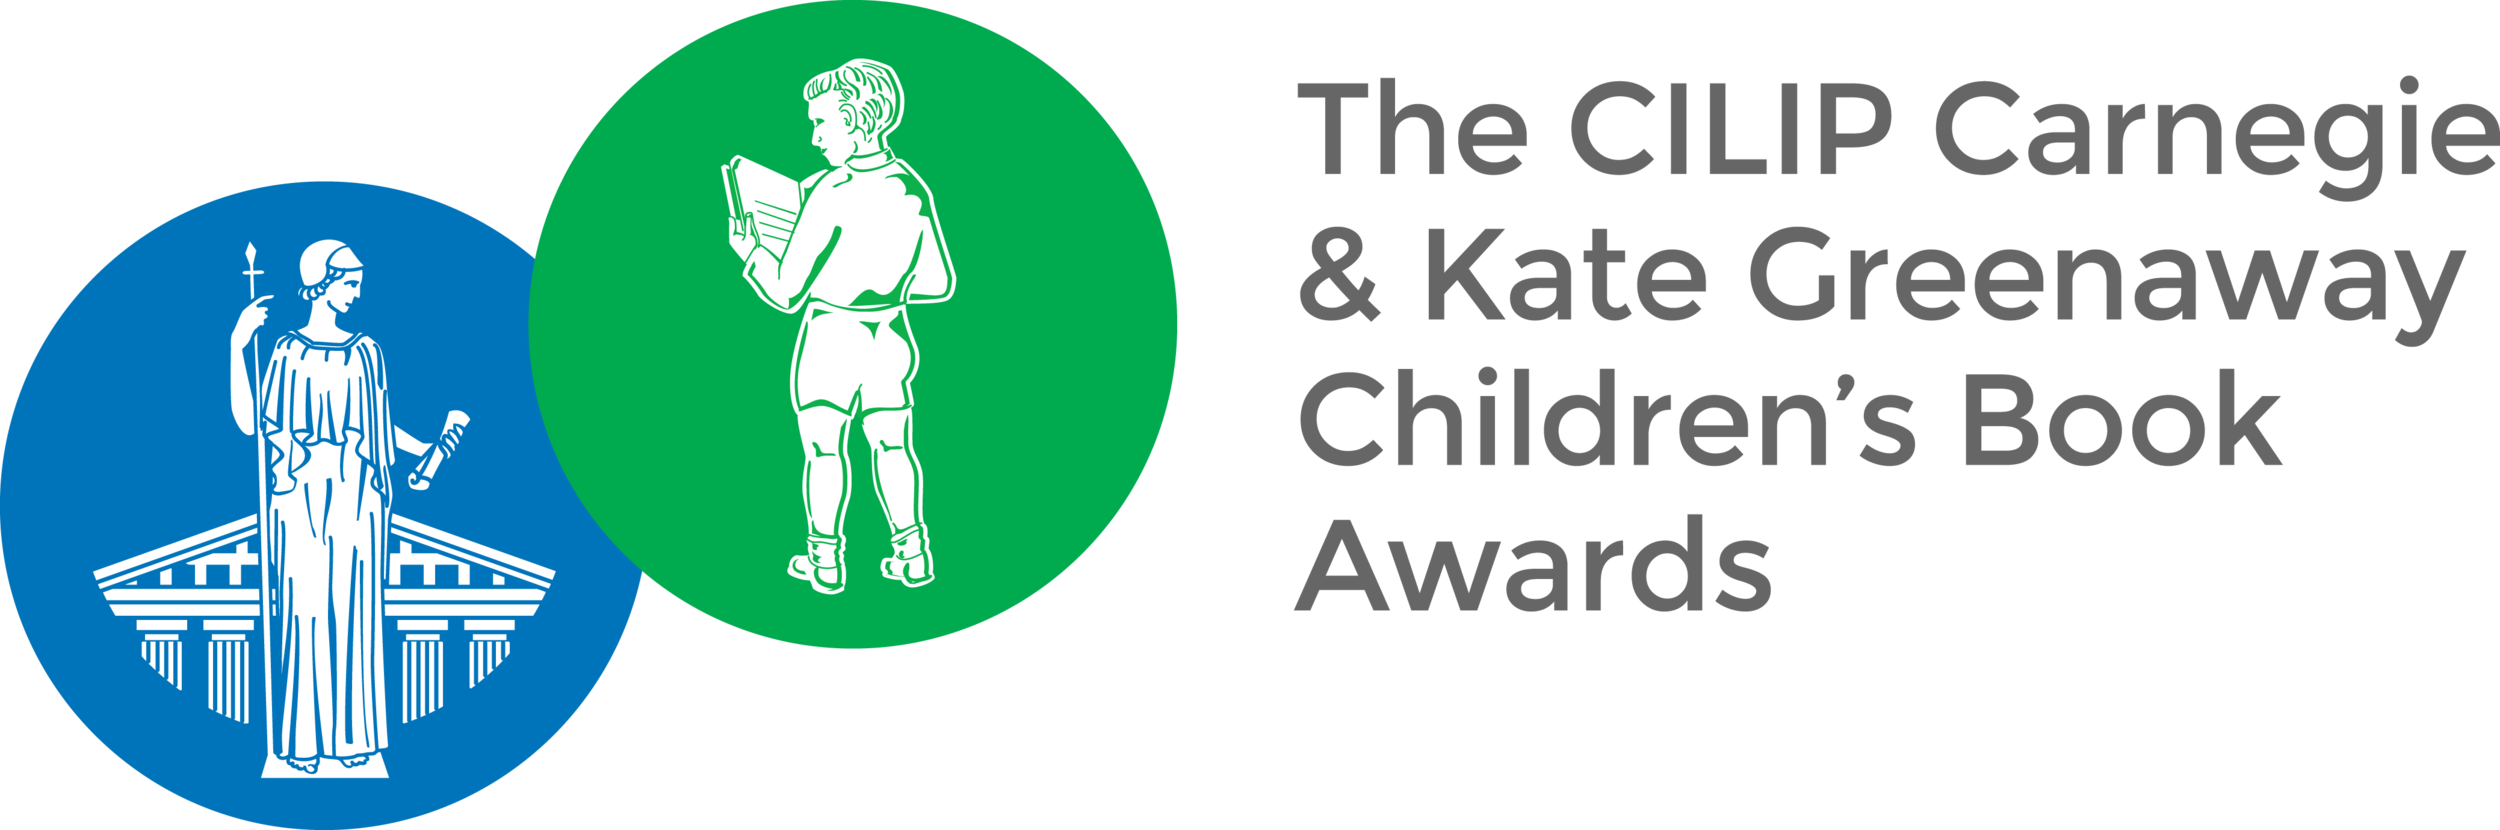 CILIP Carnegie Kate Greenaway Children's Book Awards